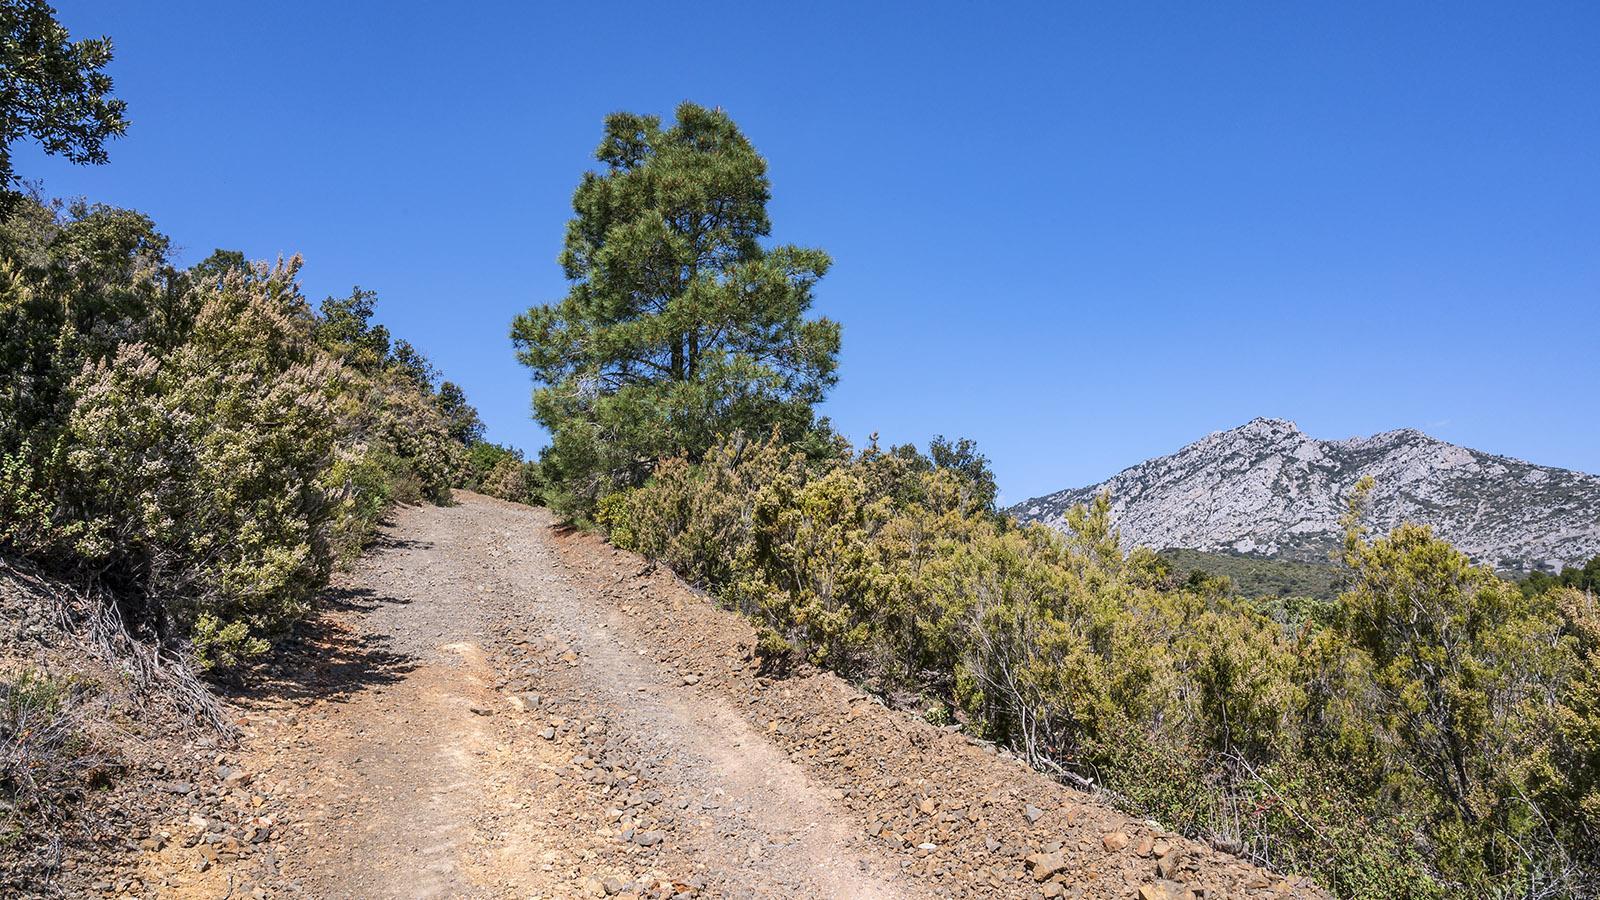 Maury: Chemin des Amorioles. Foto: Hilke Maunder